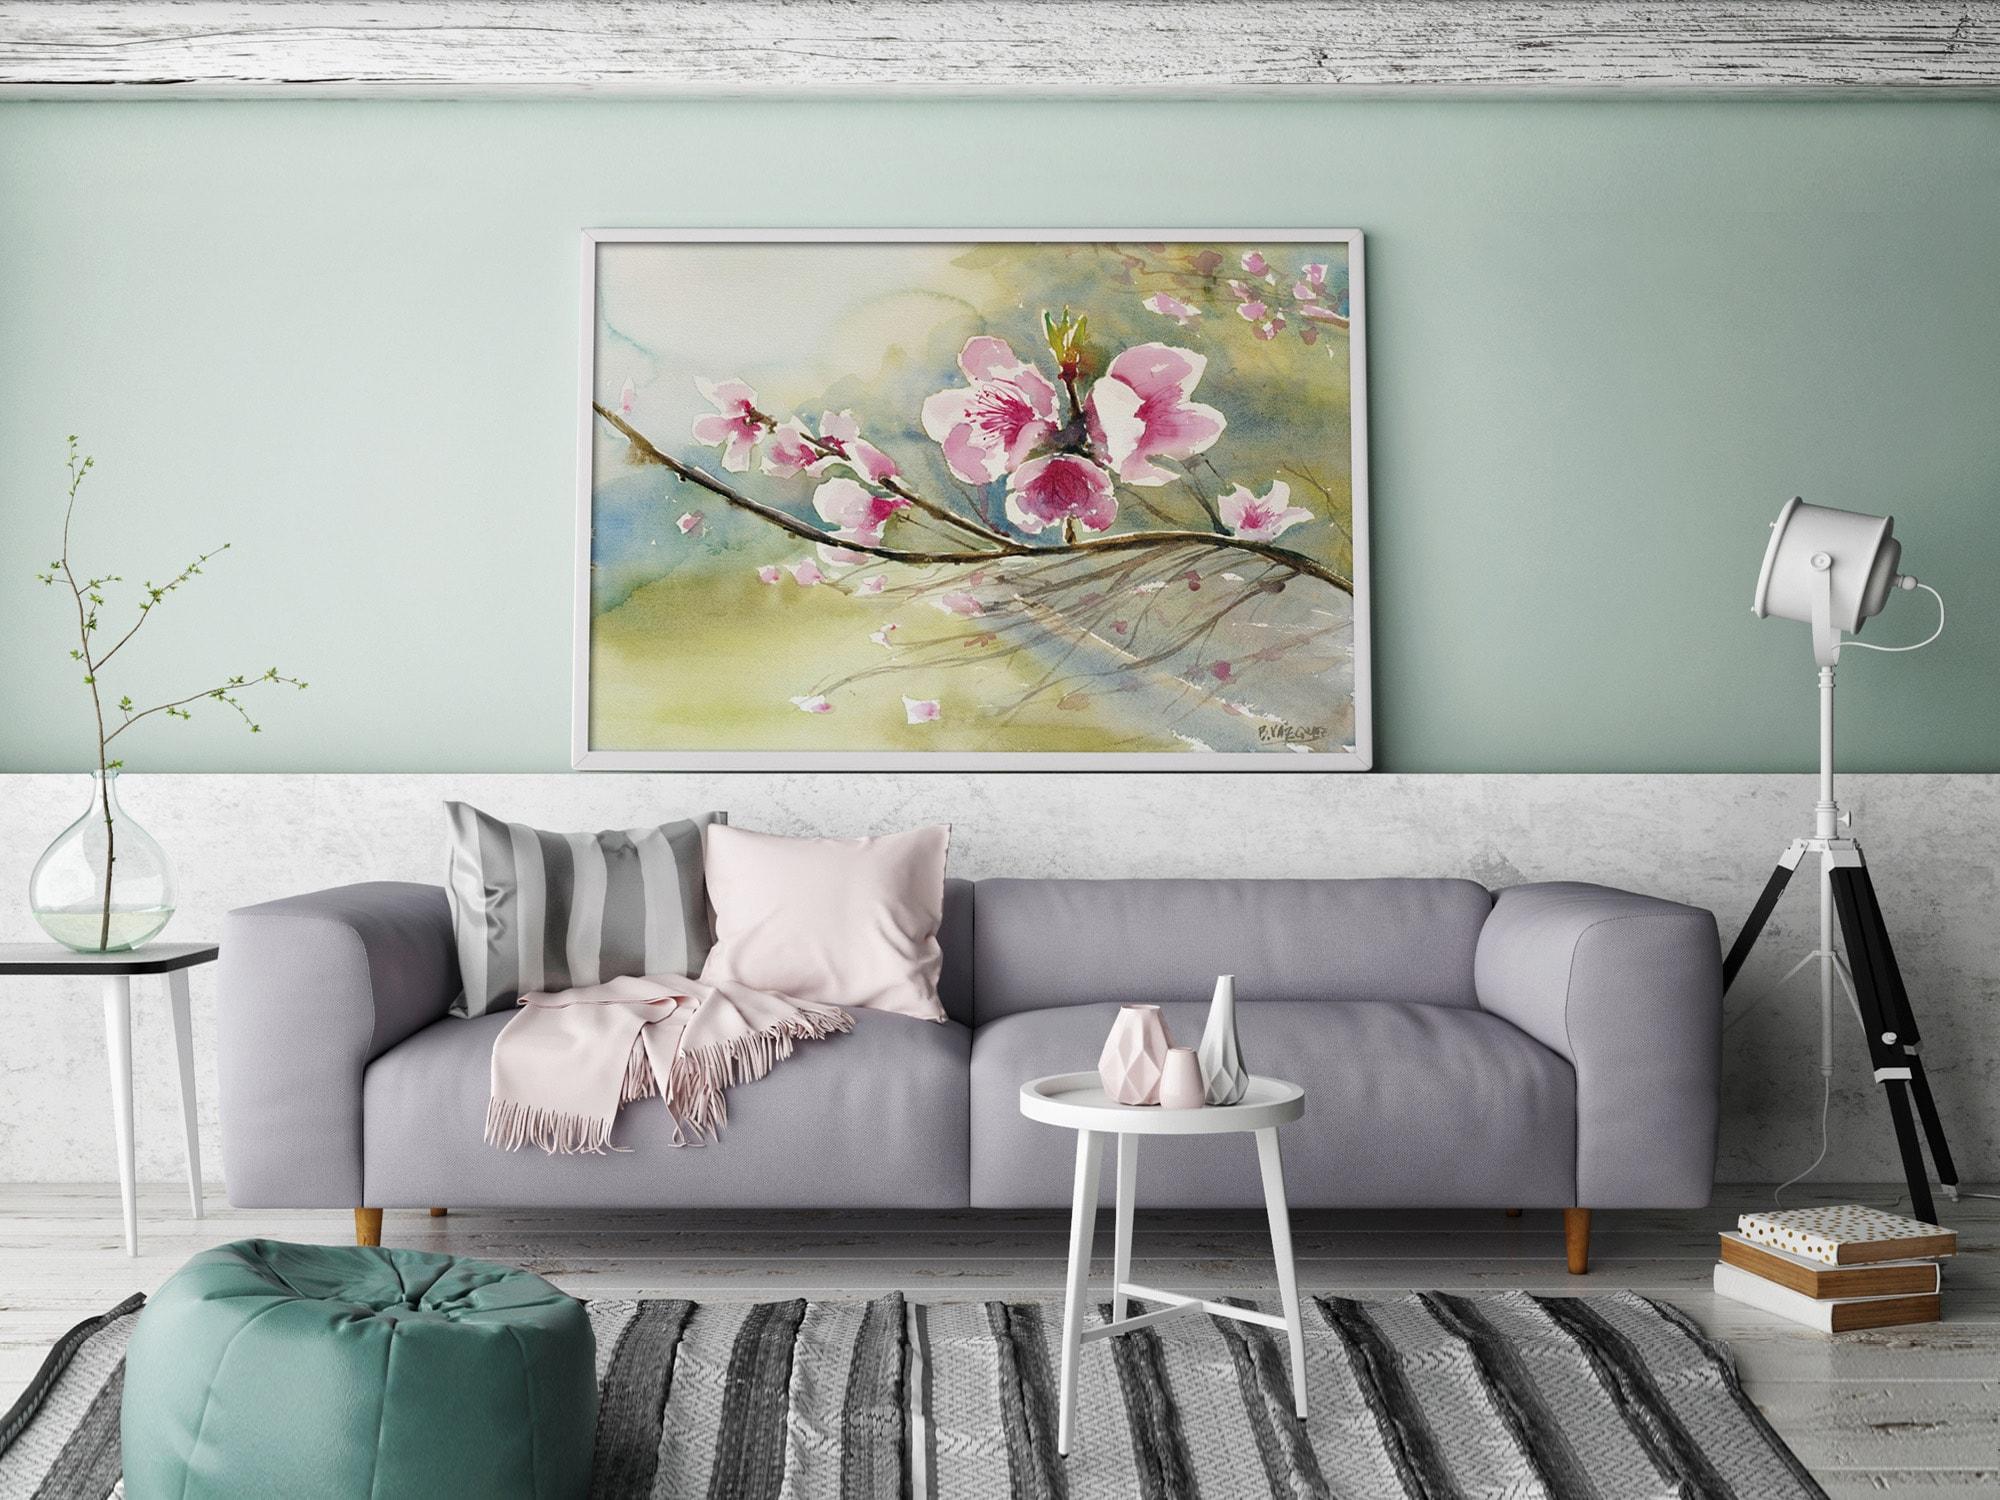 Cuadro Rama en Flor rosa